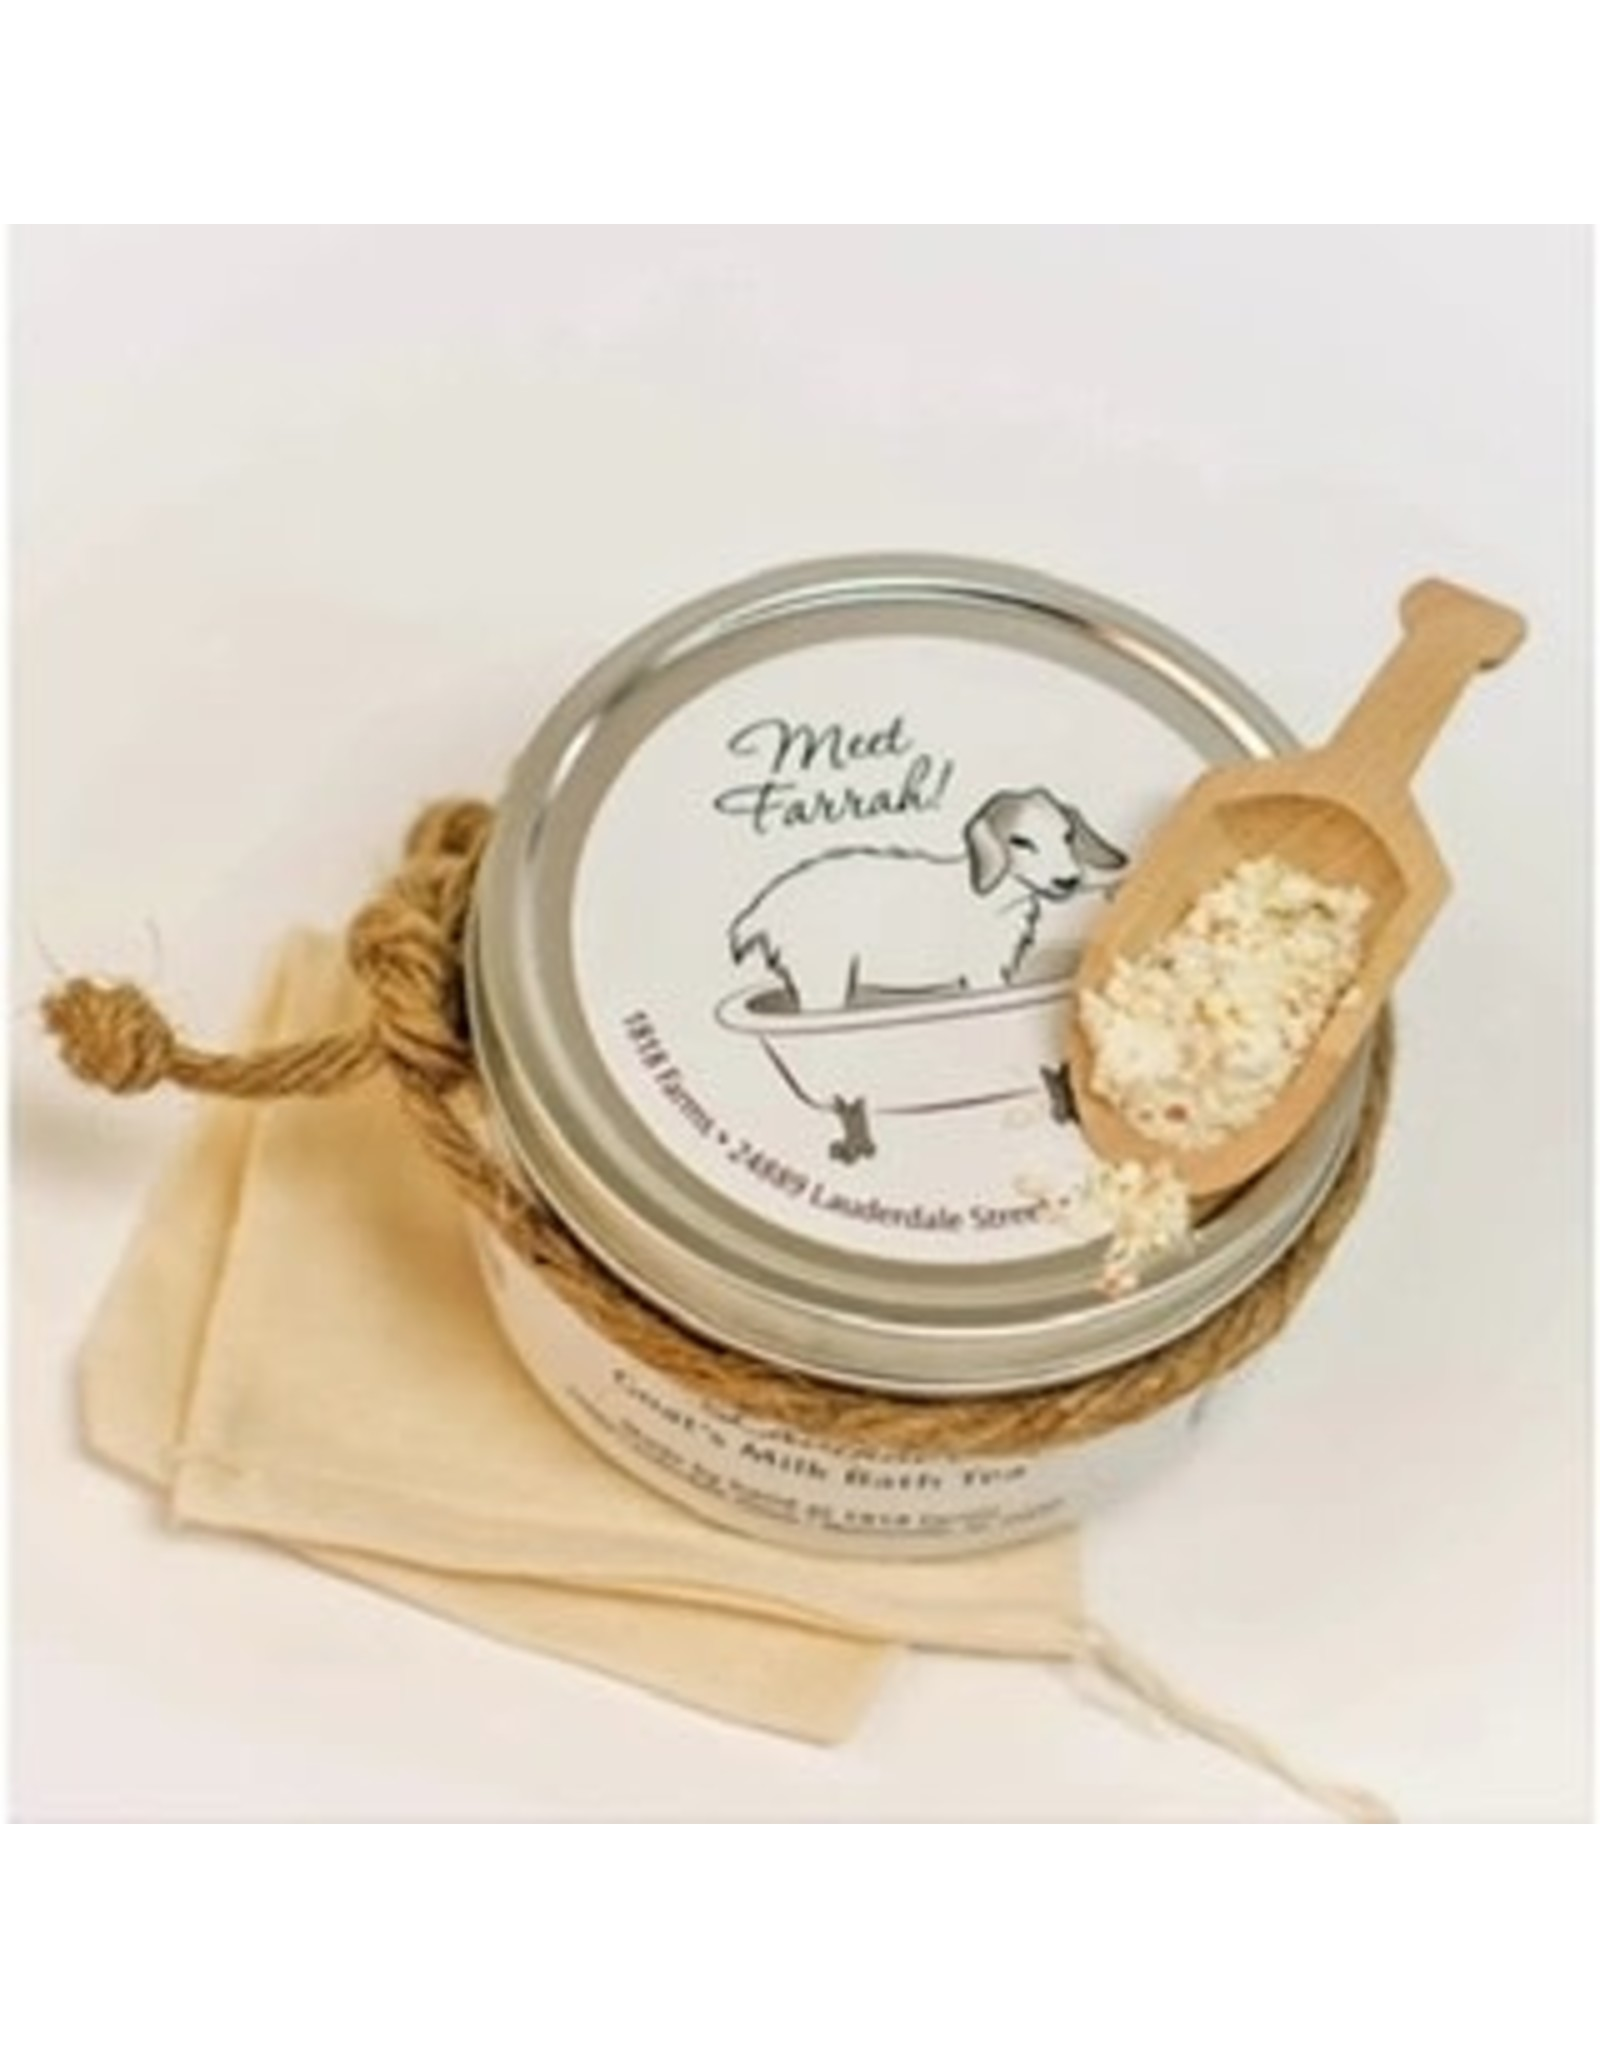 1818 Farms Lavender Goat's Milk Bath Tea Tin